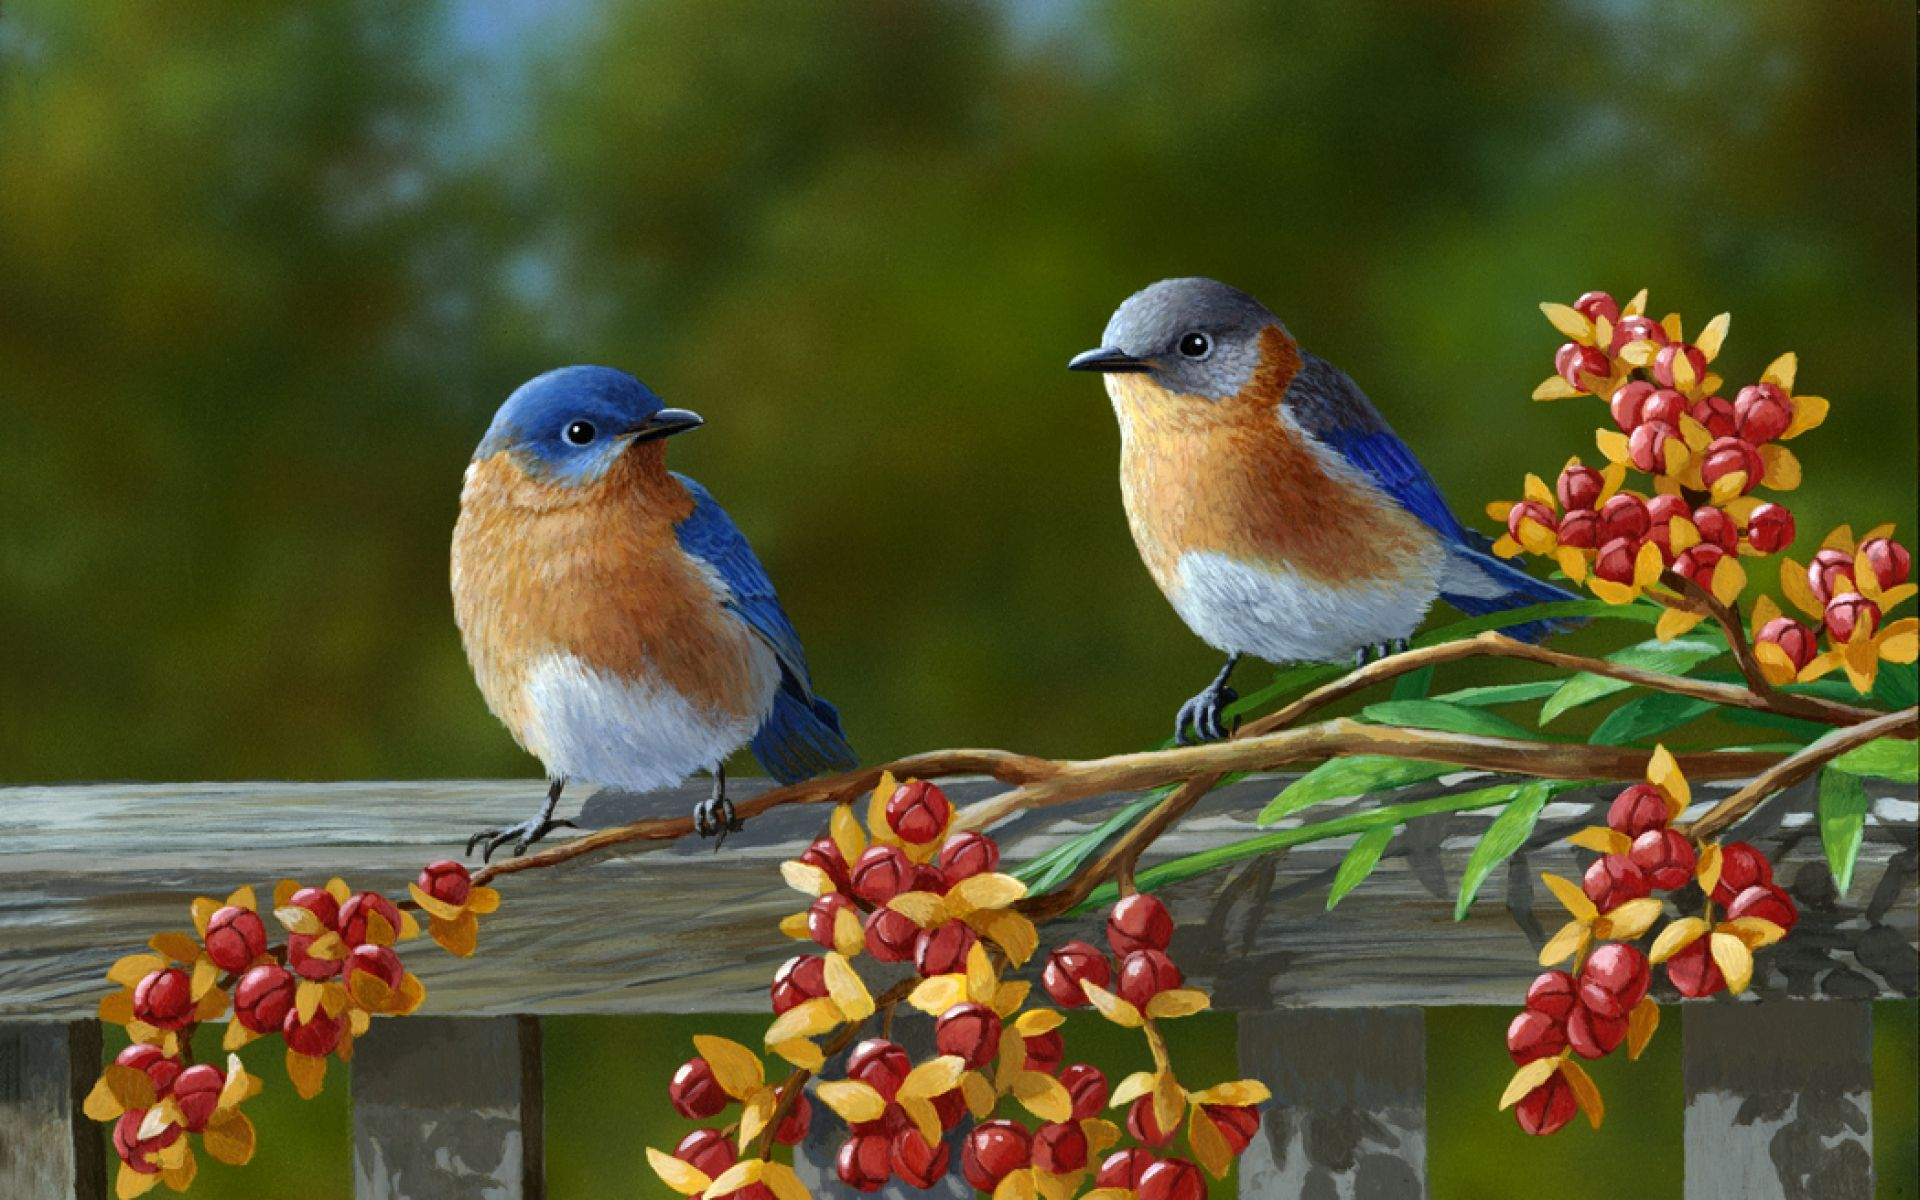 Download Beautiful Birds Wallpaper 1920x1200 Full Hd Wallpapers